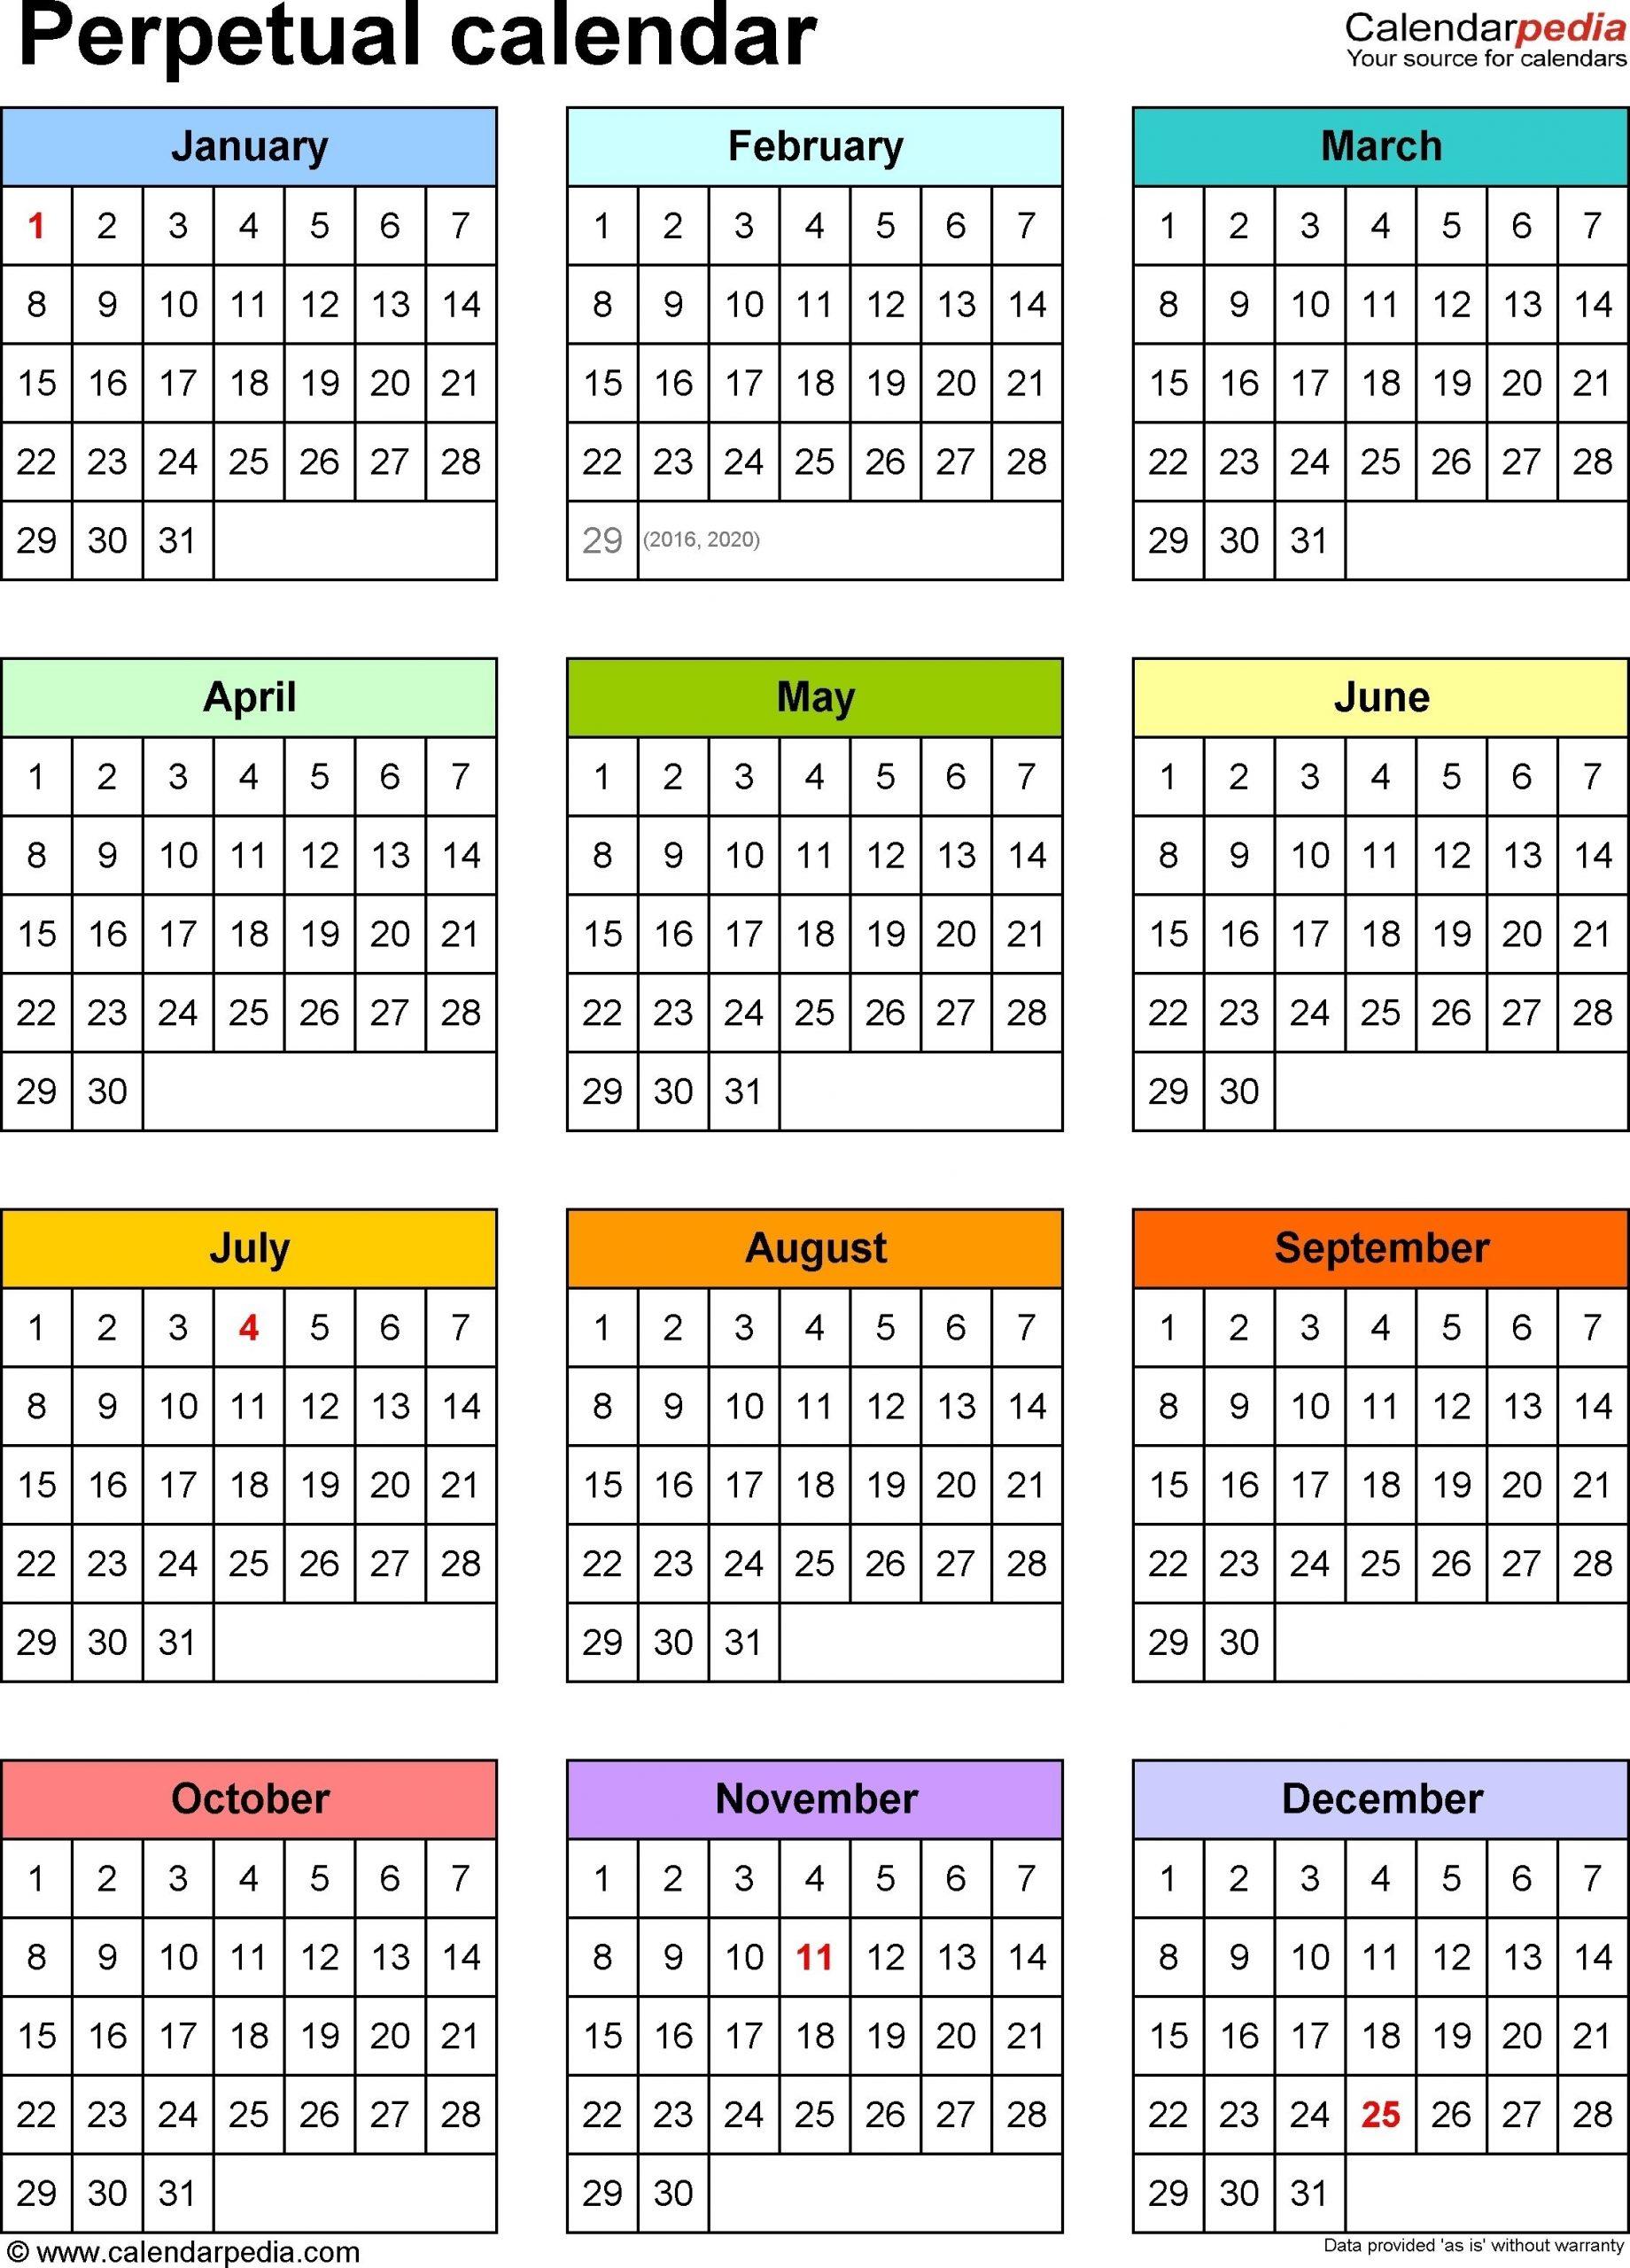 Depo Provera Perpetual Calendar 2019 Printable - Template Calendar Dowload   Monthly Calendar